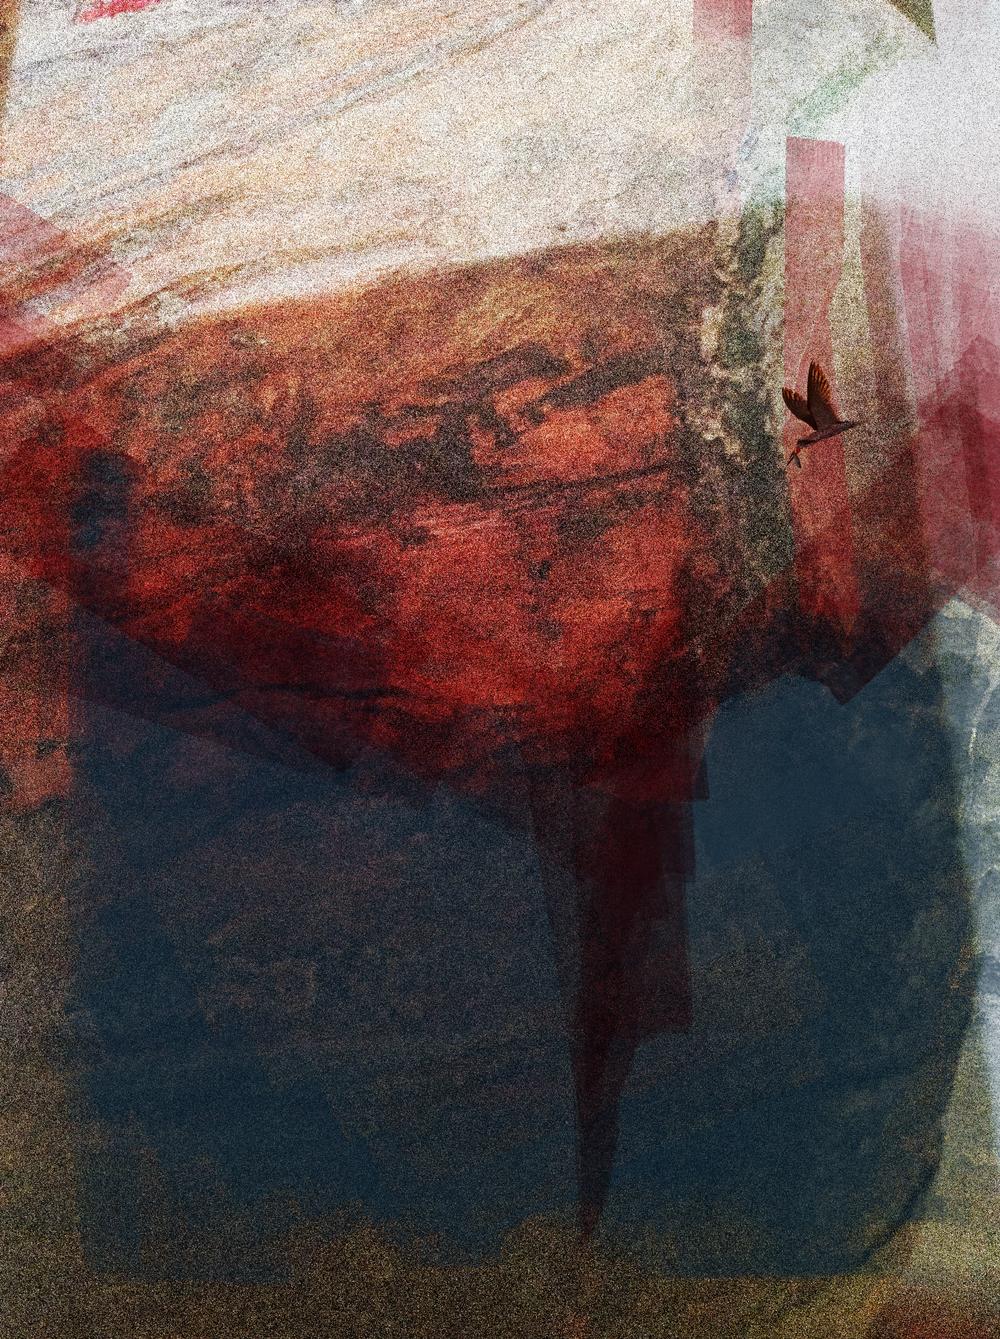 Deep Oil artwork by Rachael Muir - art listed for sale on Artplode